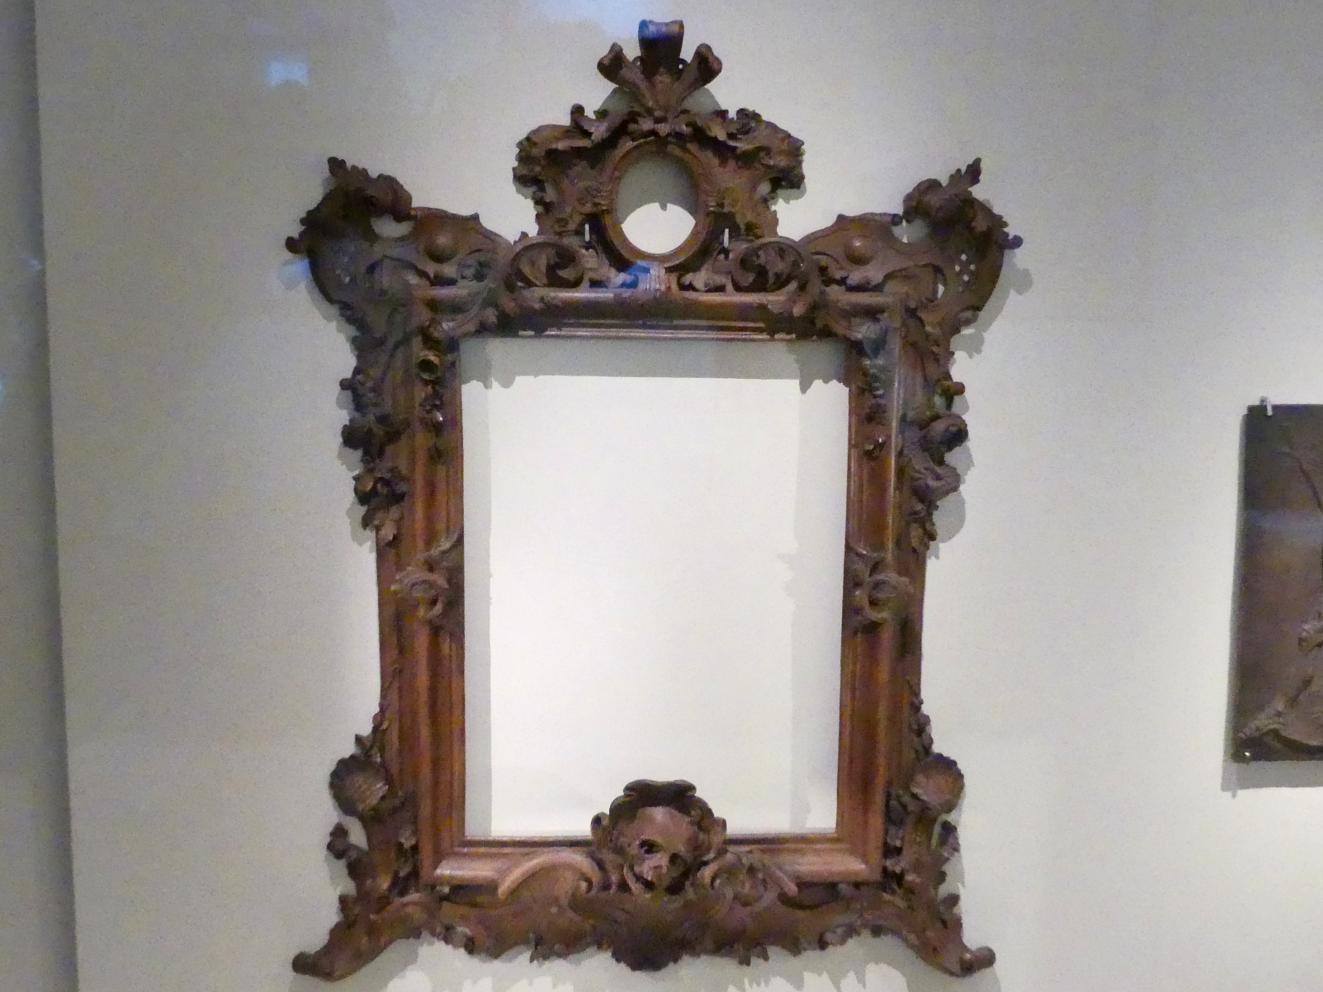 Paul Egell: Rahmen mit Vanitasmotiven, Um 1720 - 1725